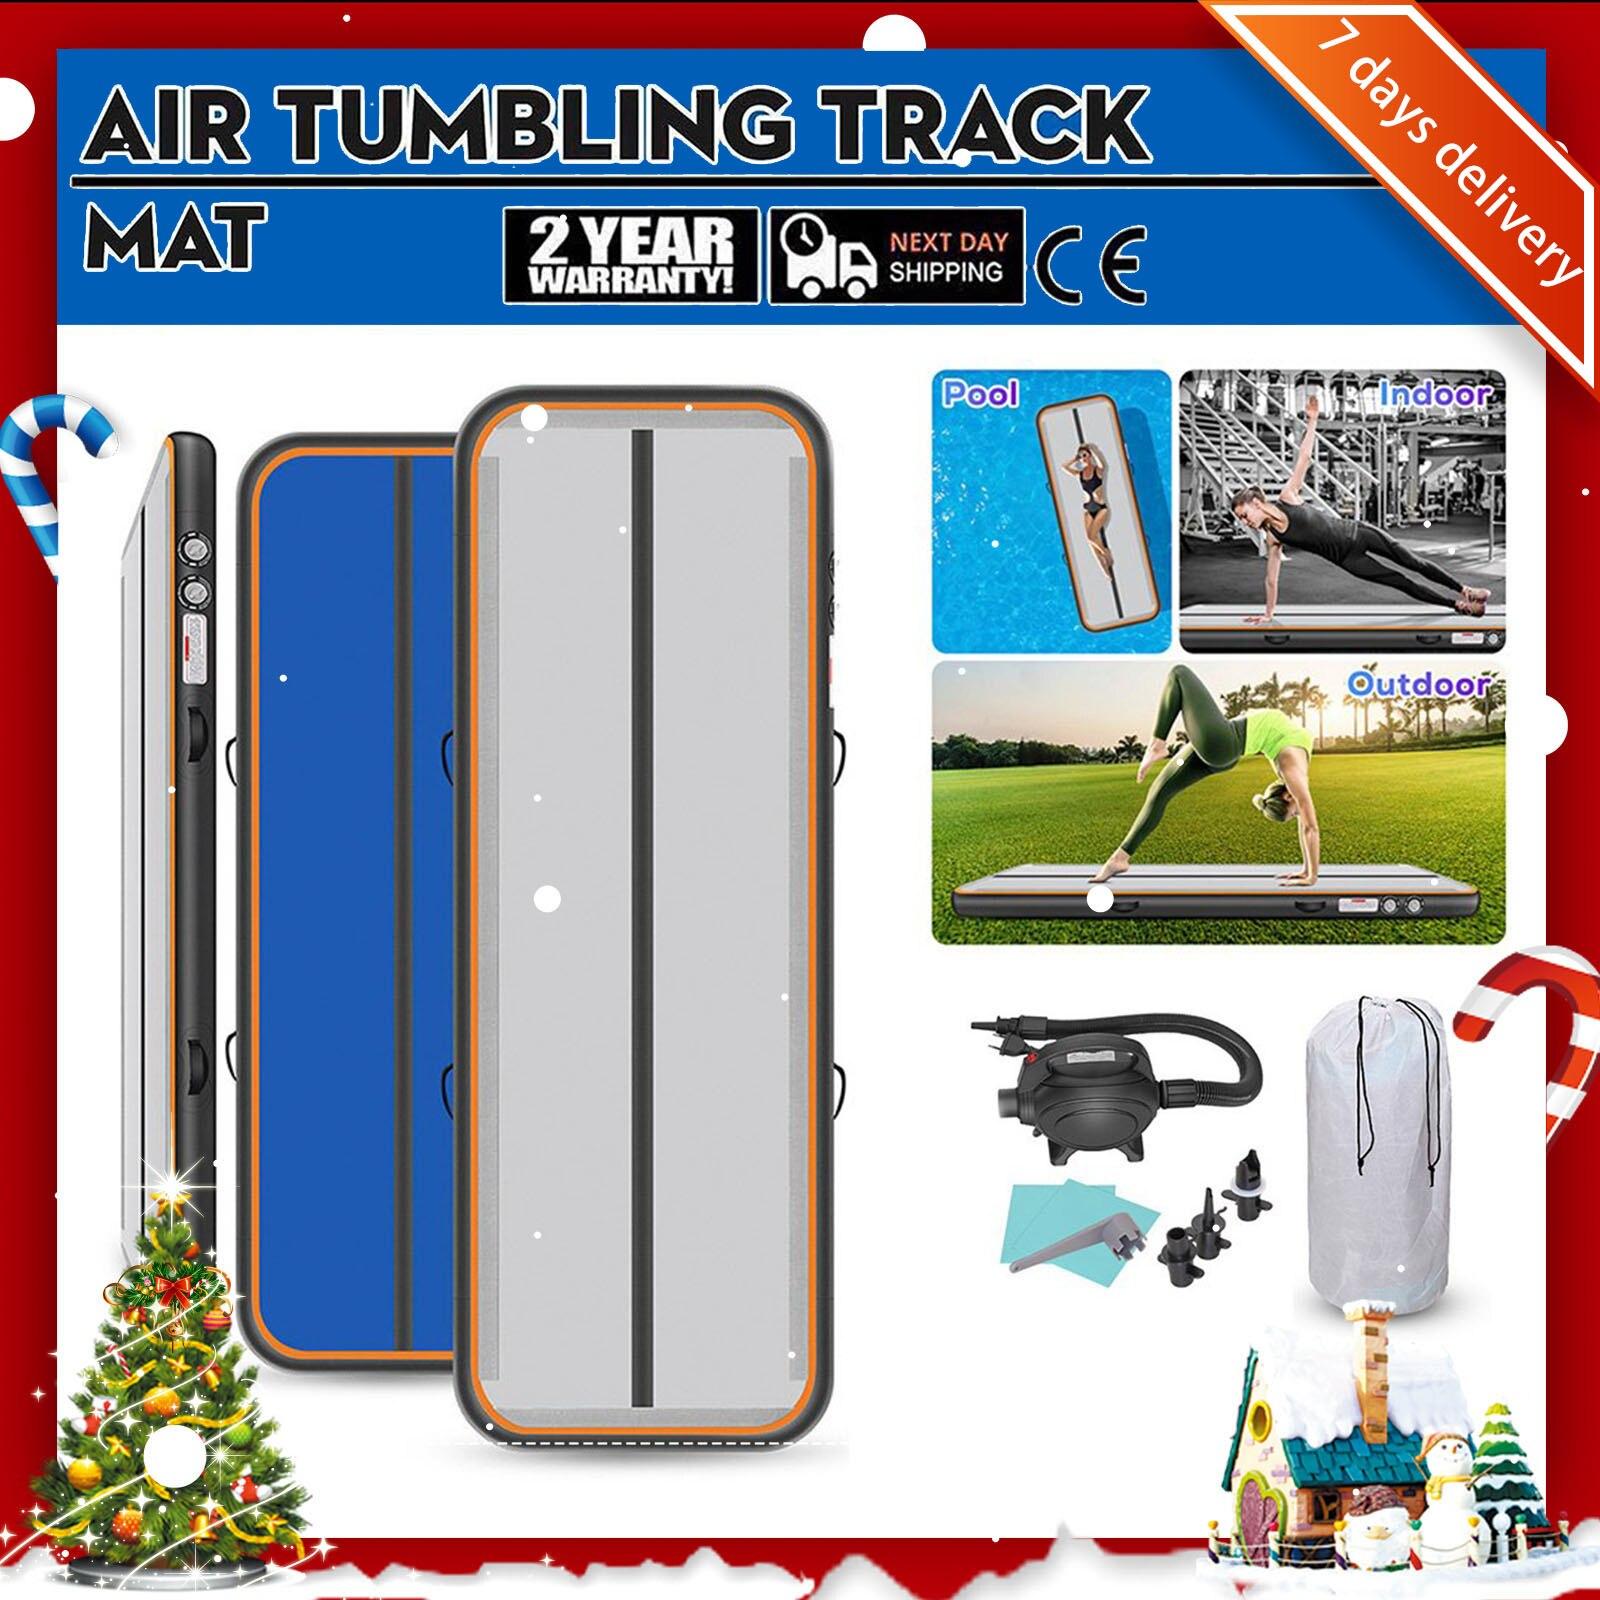 Rimdoc Inflatable Air Track Gymnastics Mats For Gym Kids Inflatable Gym Mat Yoga Mat Tumbling Mat For Traning/Yoga/Cheerleading